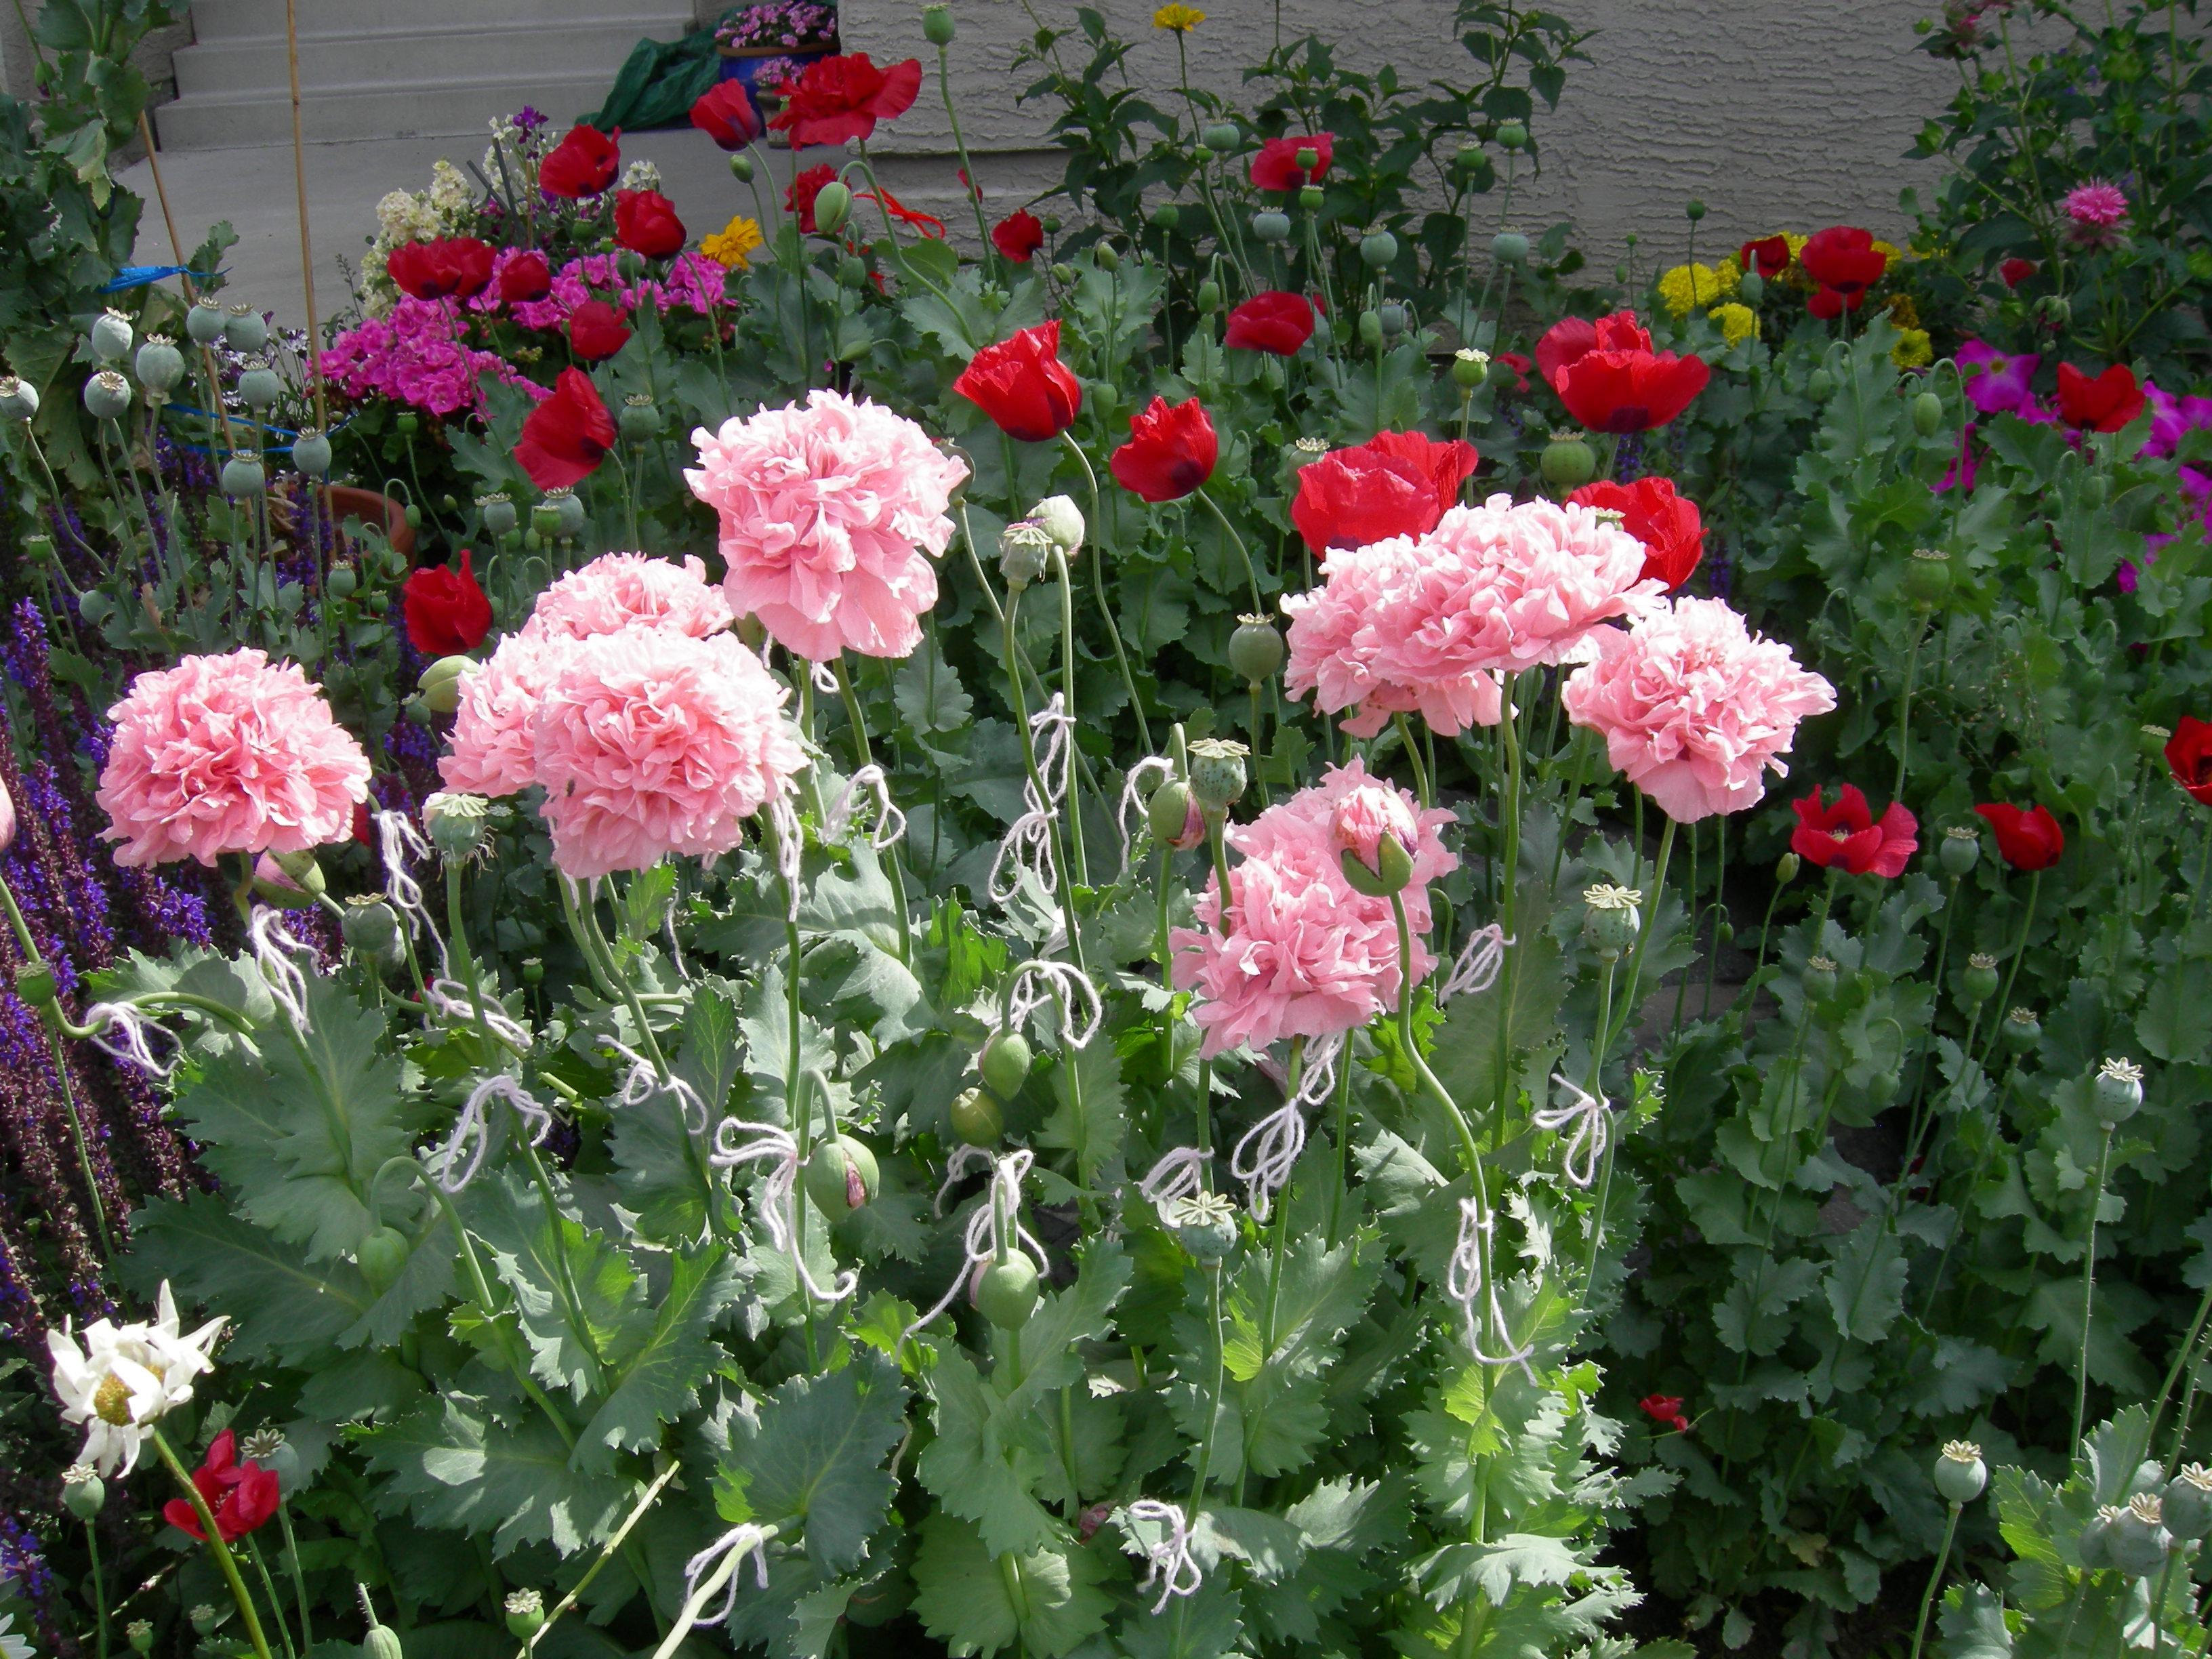 Collecting Poppy Seeds | Wellspring Calgary Community Garden